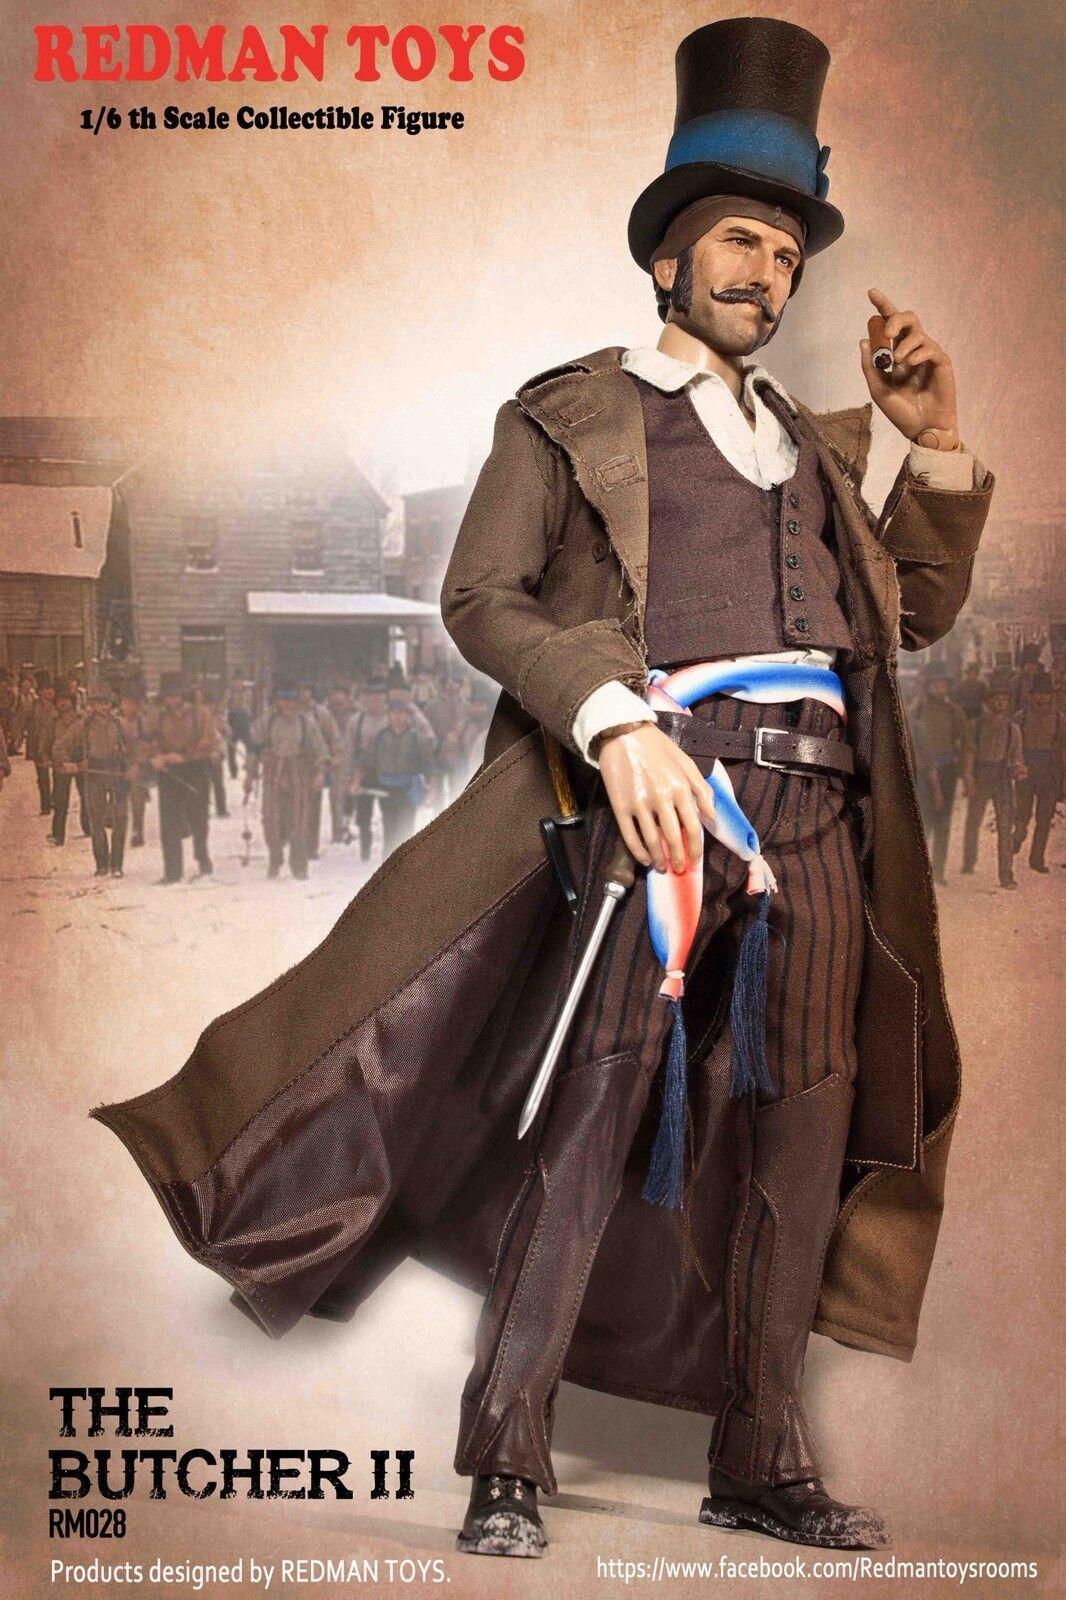 RossoMAN TOYS 1/6 Gangs Of Nuovo York Bill The Butcher II Figure RM028 Rainman